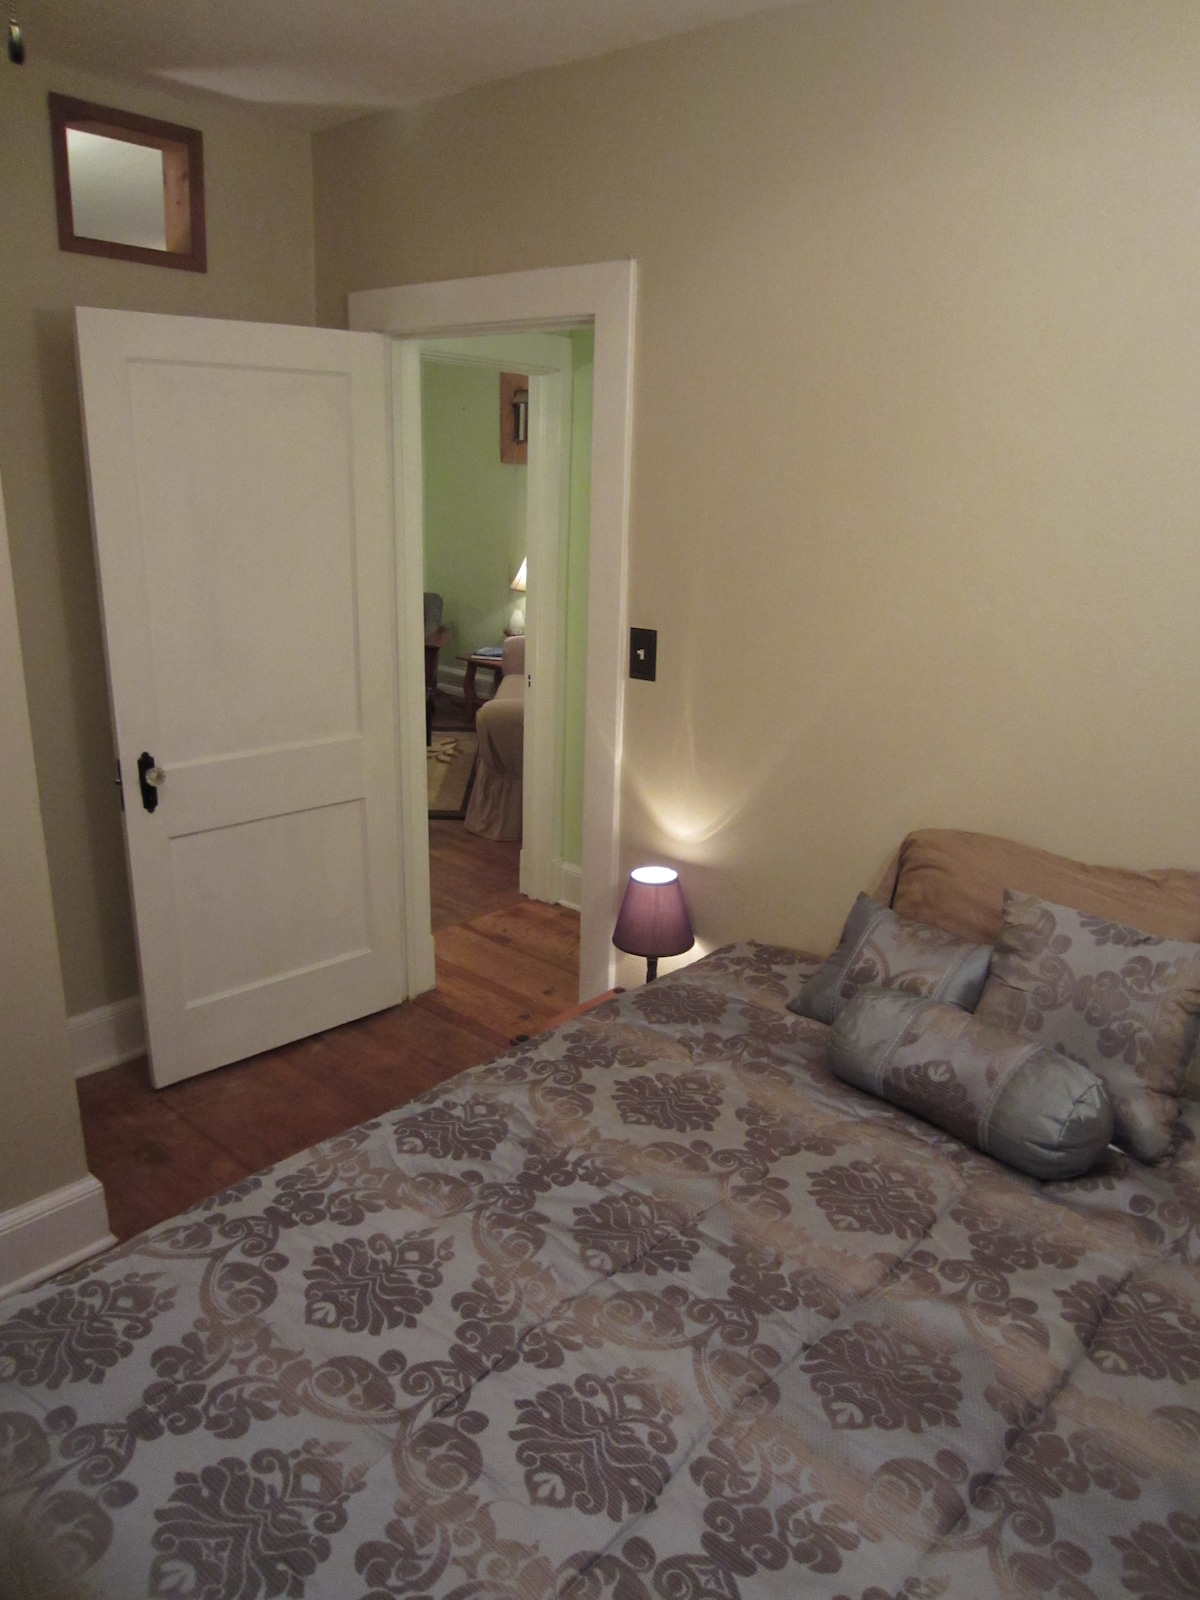 Second bedroom looking toward living room.